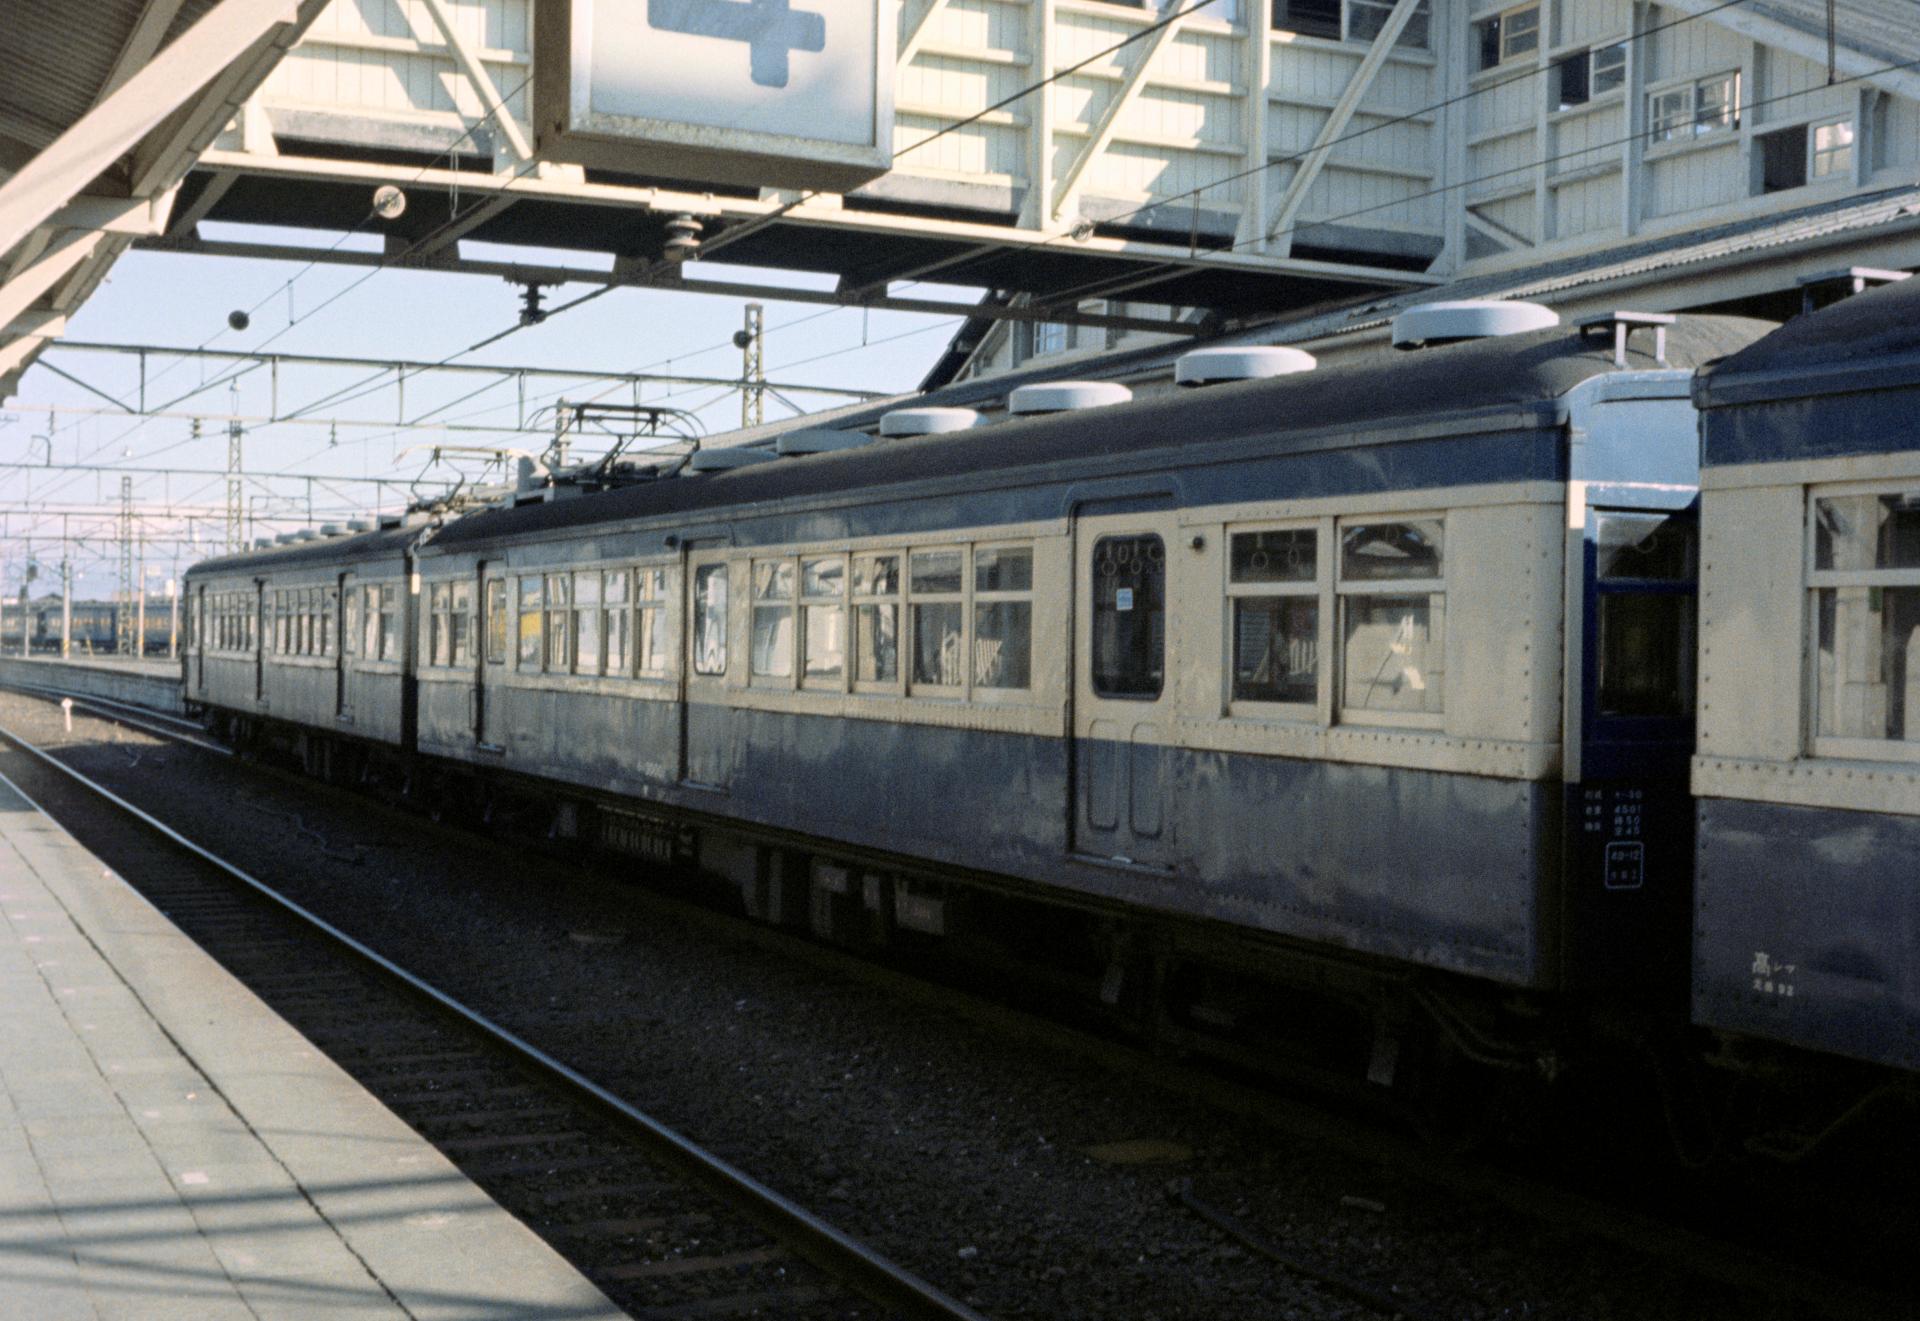 f:id:yasuo_ssi:20210715174016p:plain